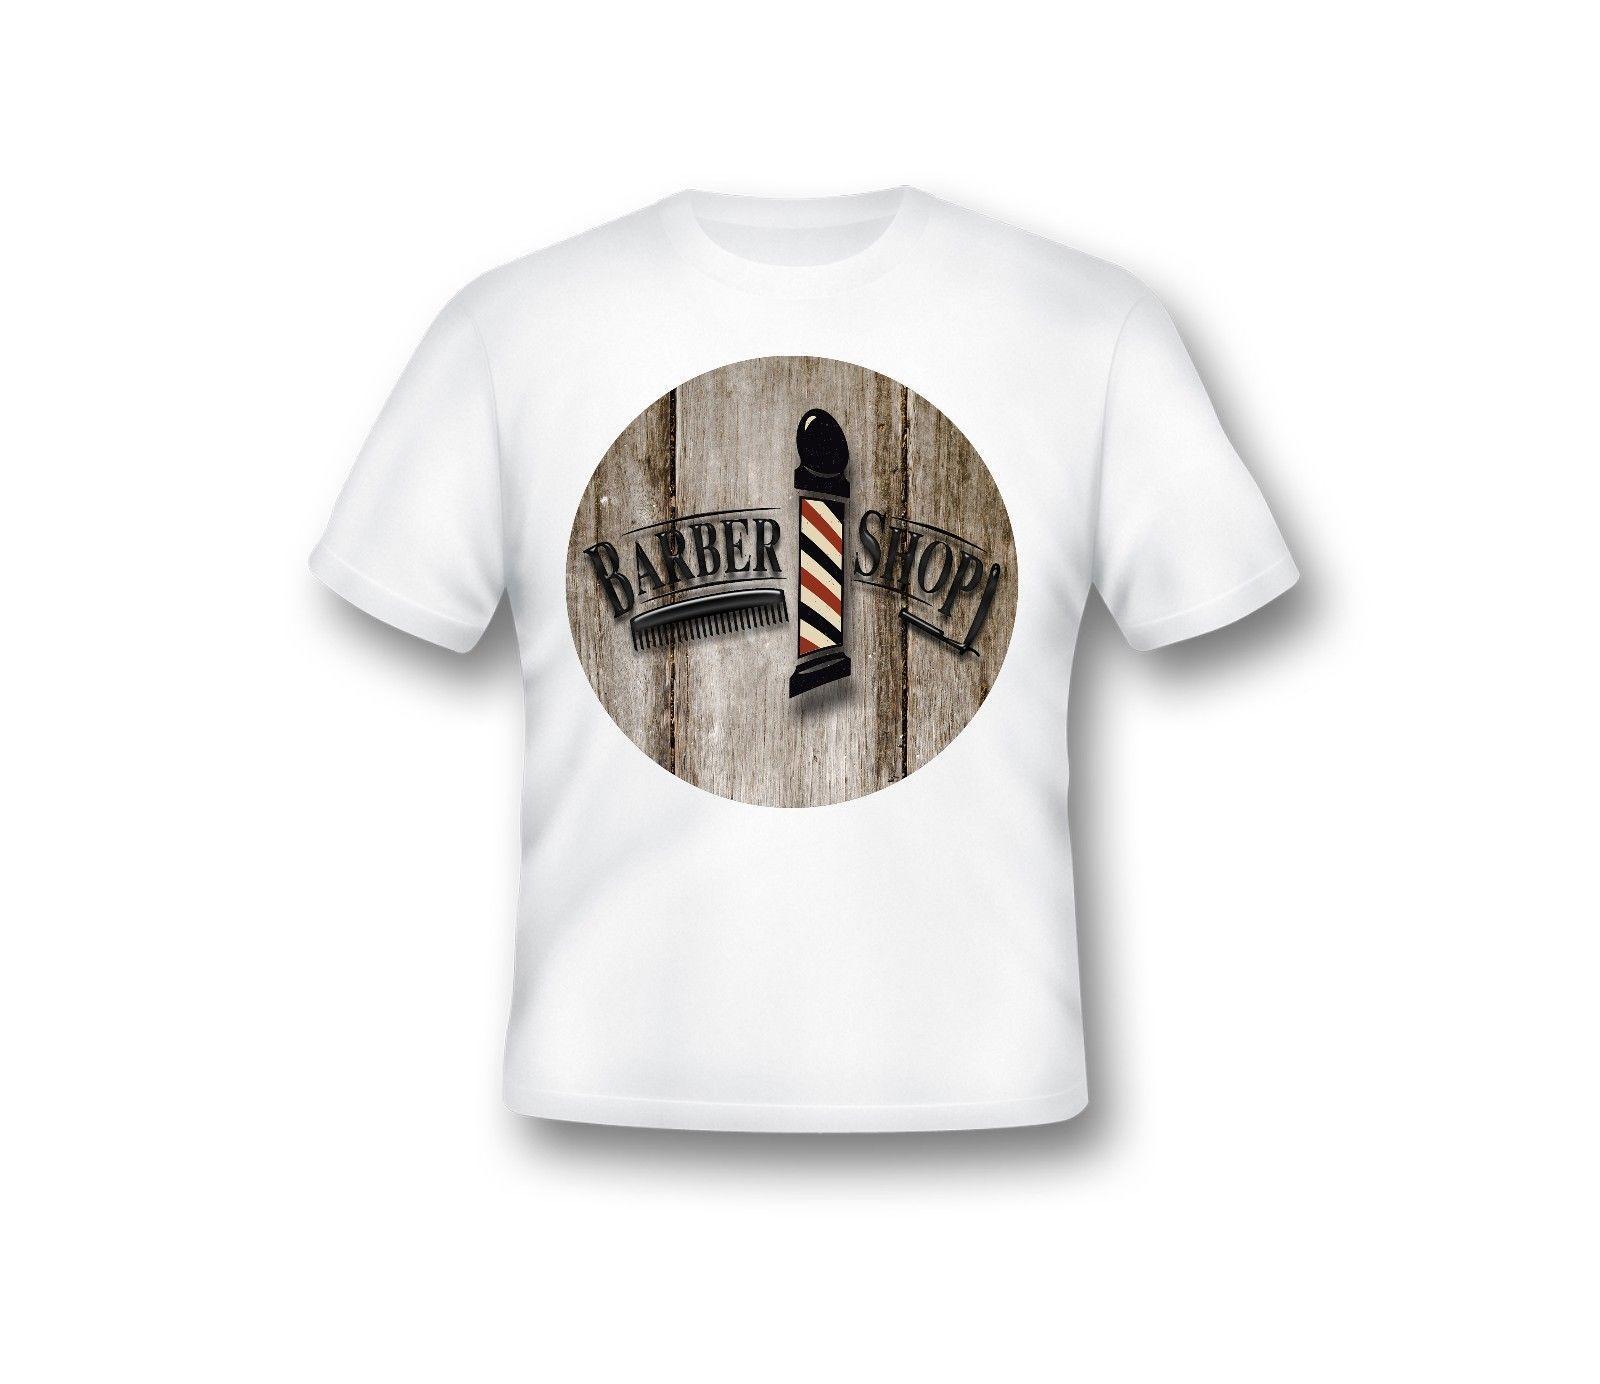 385bdbaa9fdcb9 Friseursalon T Shirt